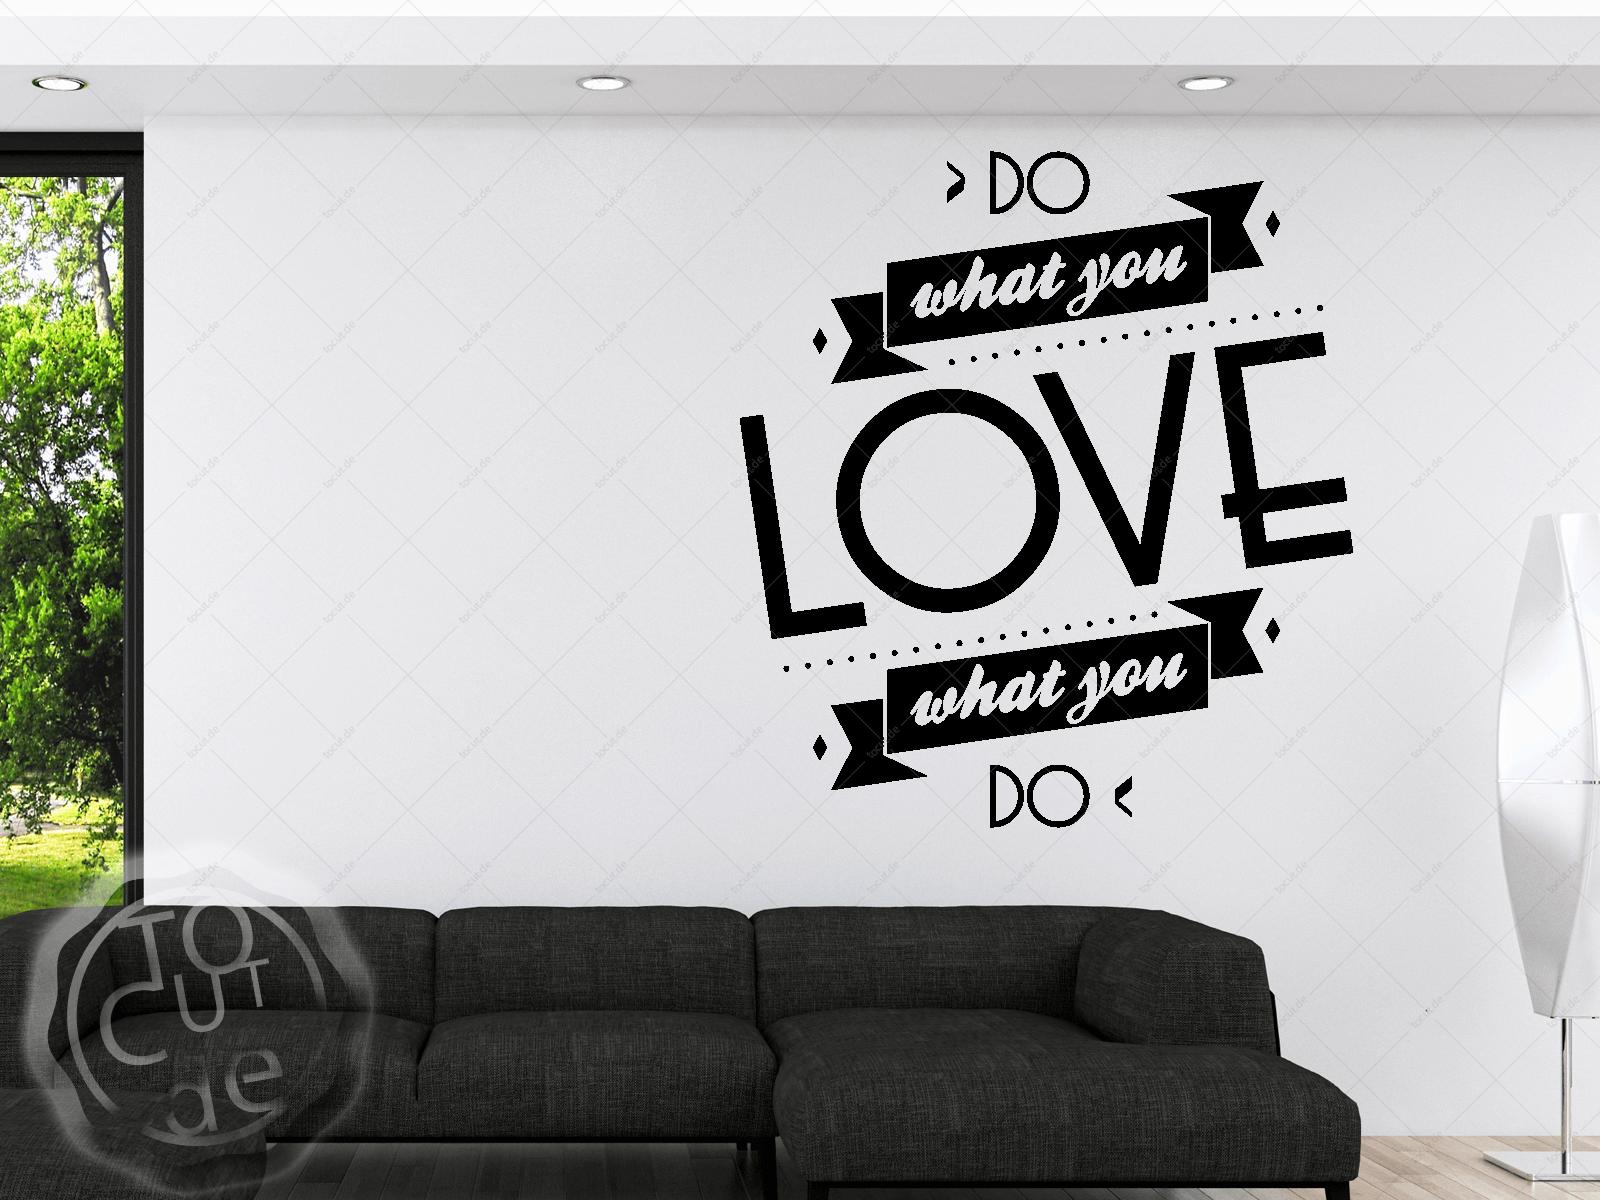 wandtattoo do what you love wohnzimmer k che schlafzimmer wandaufkleber schriftzug tocut. Black Bedroom Furniture Sets. Home Design Ideas